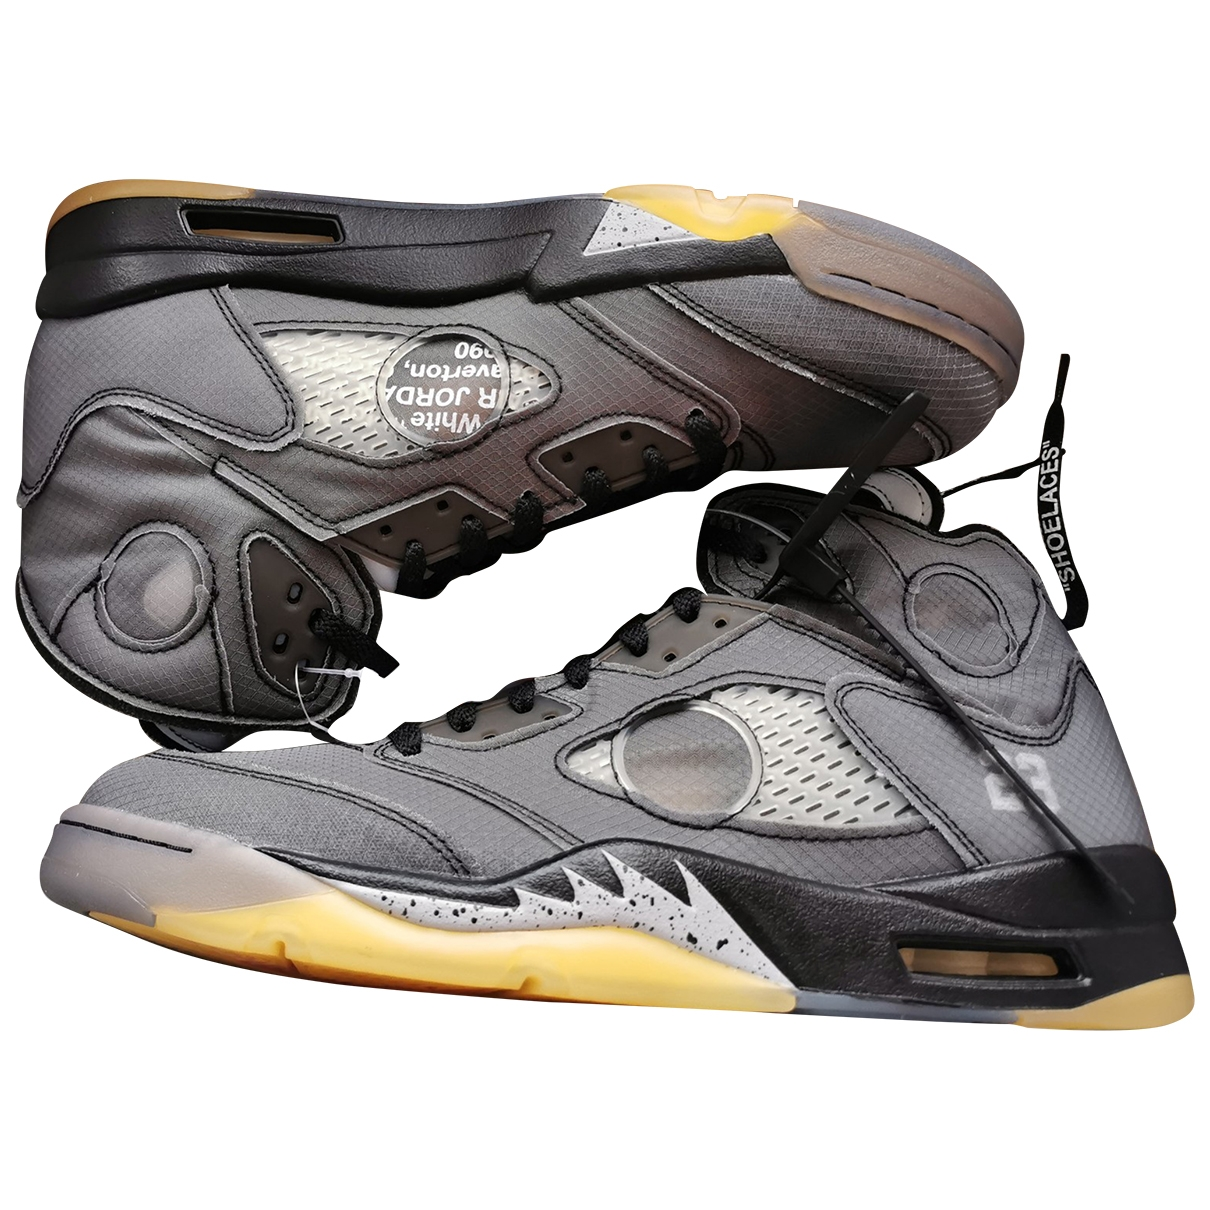 Nike X Off-white - Baskets Jordan 5 pour homme en cuir - anthracite